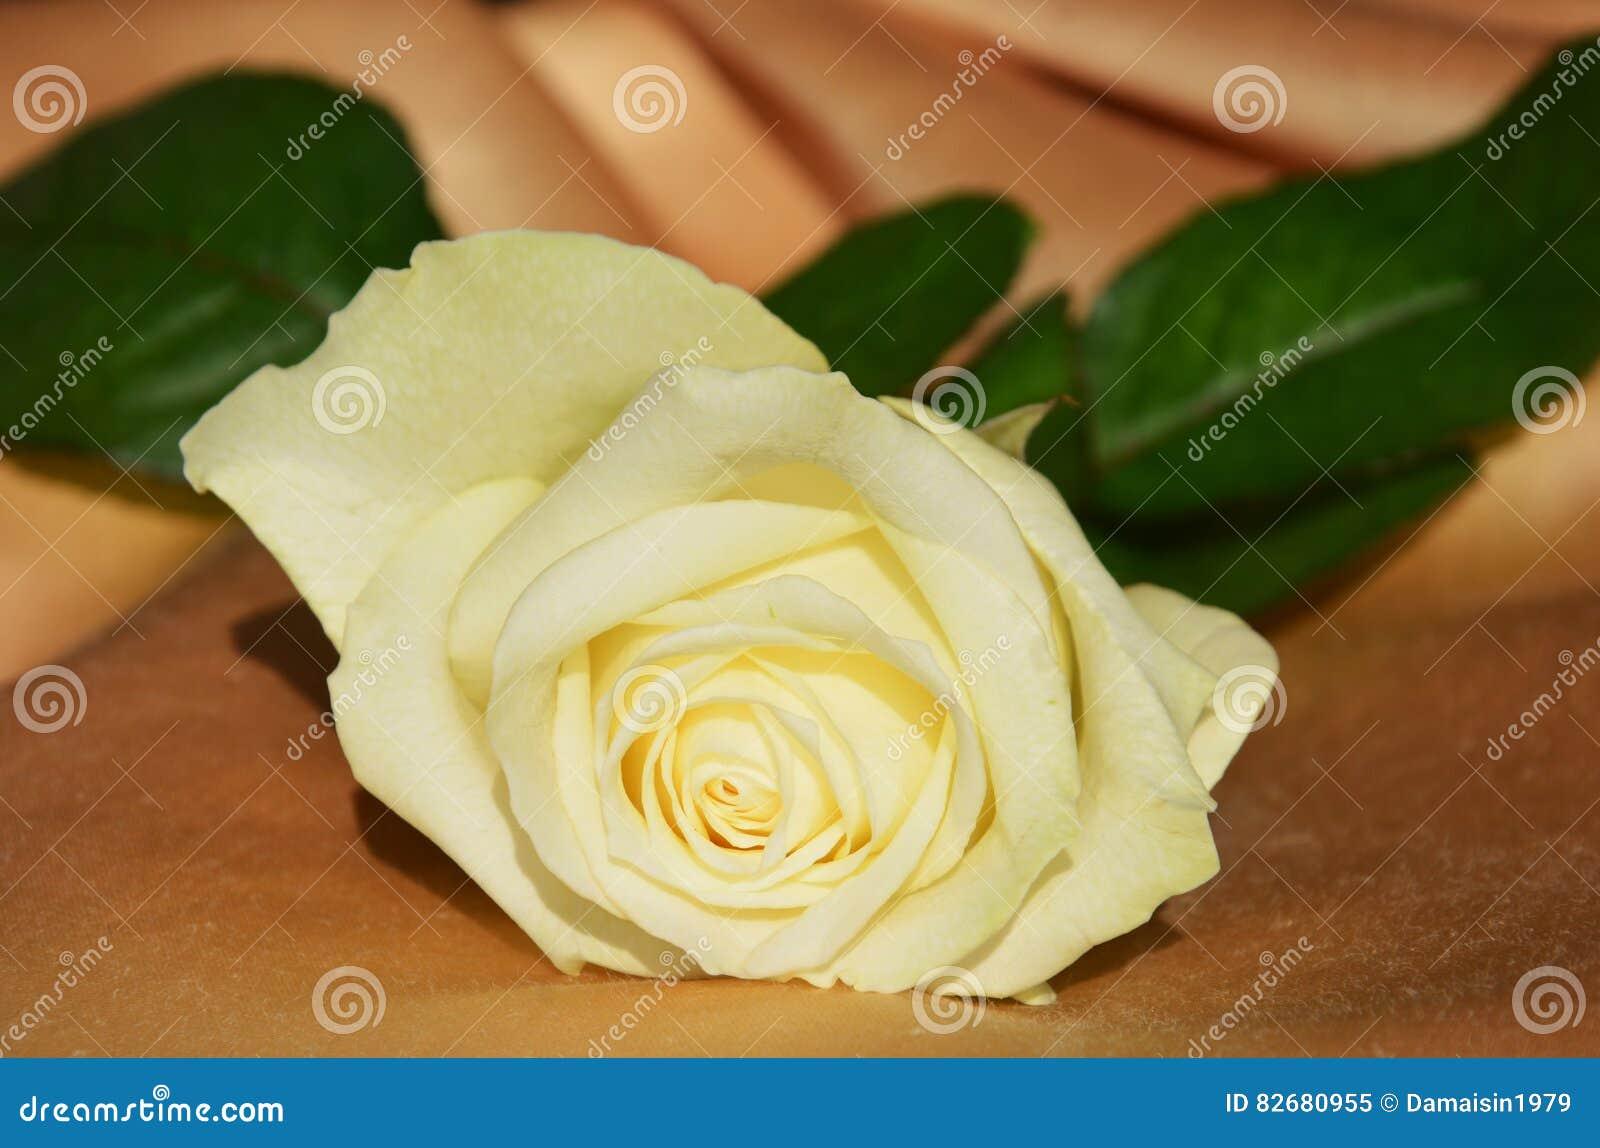 Symbol Of Purity Stock Image Image Of White Love Elegance 82680955